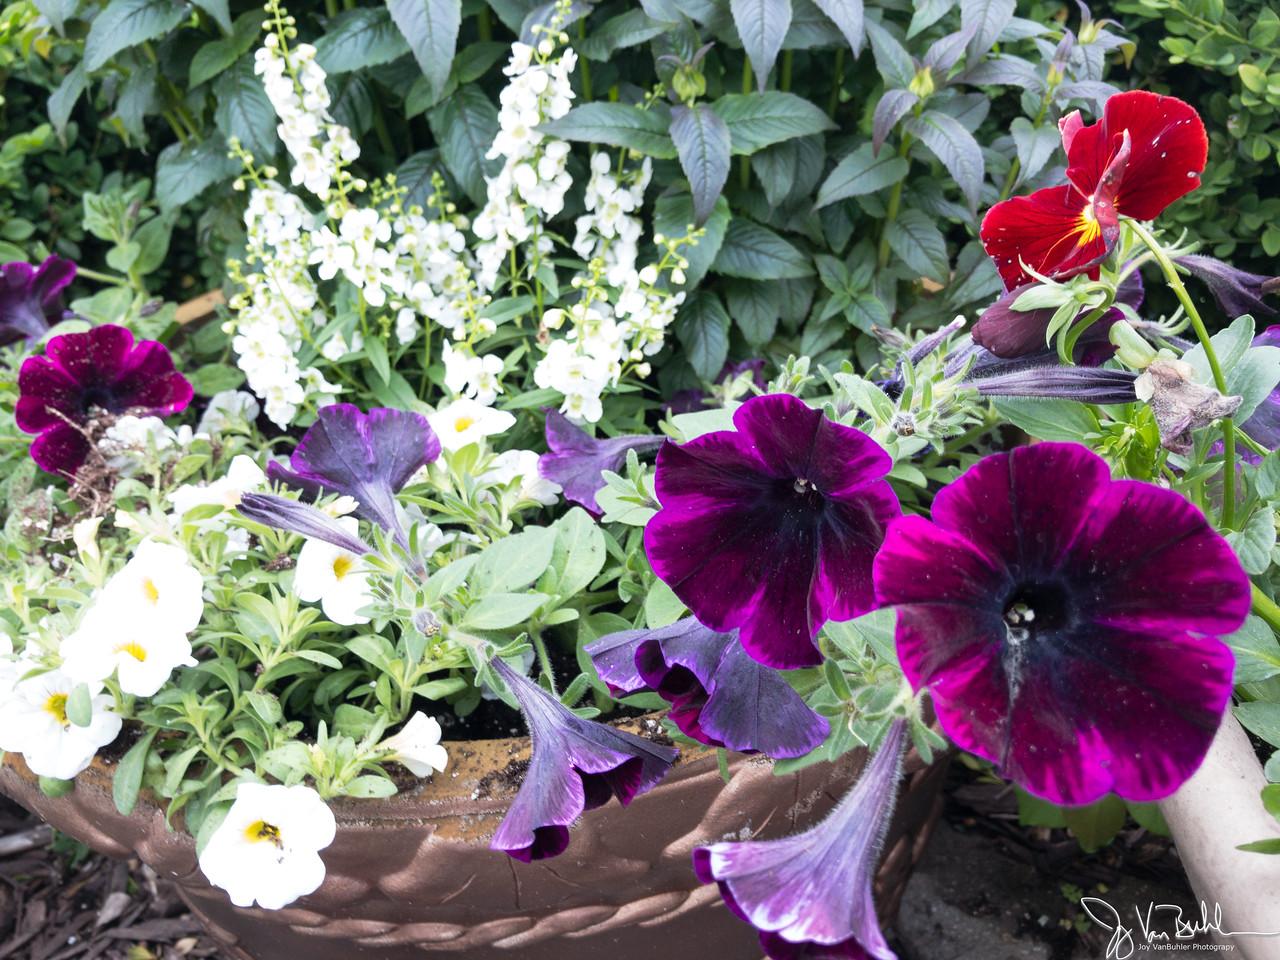 146/365 - Flowers